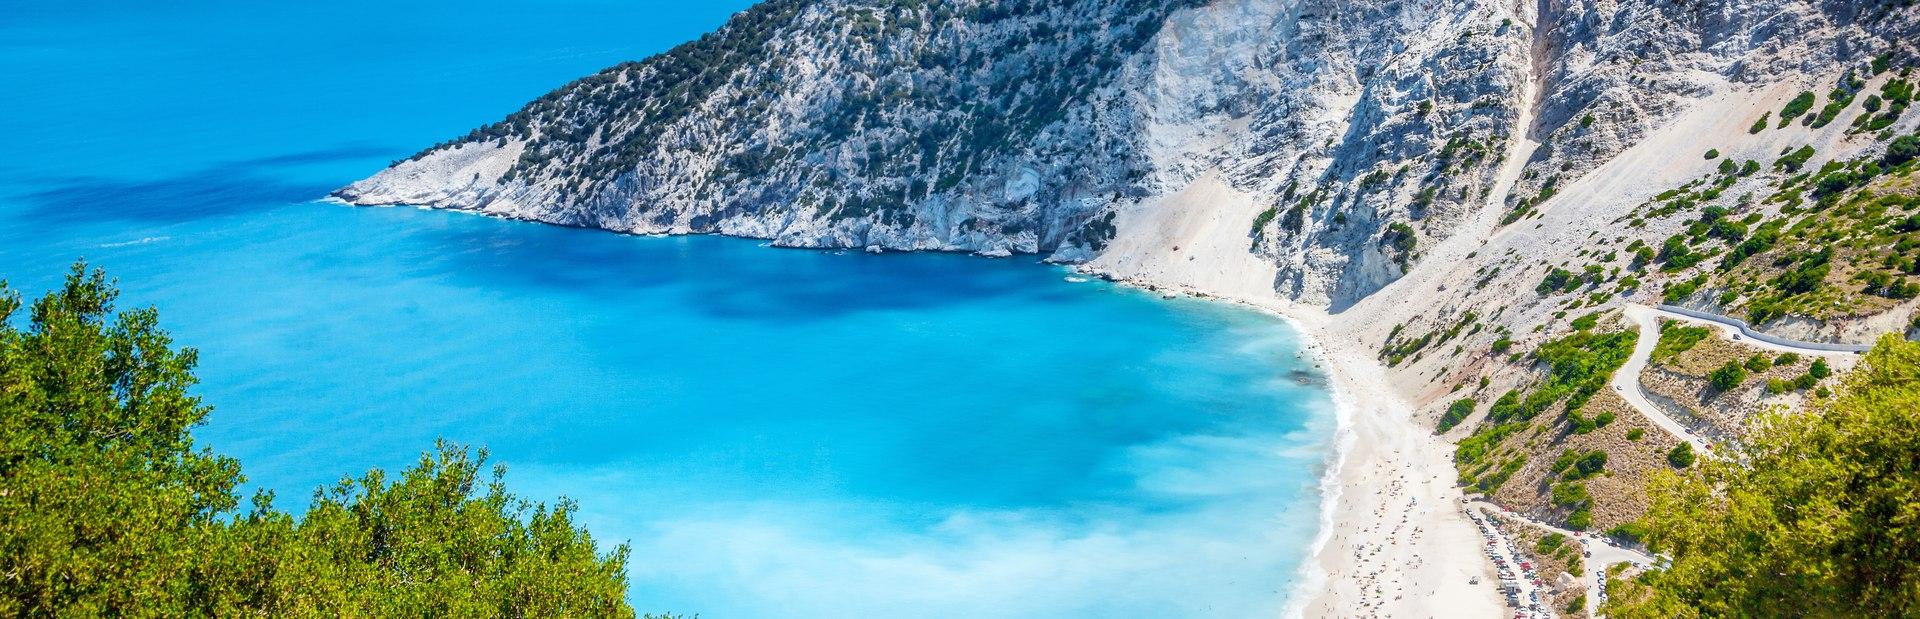 Myrtos Beach Image 1